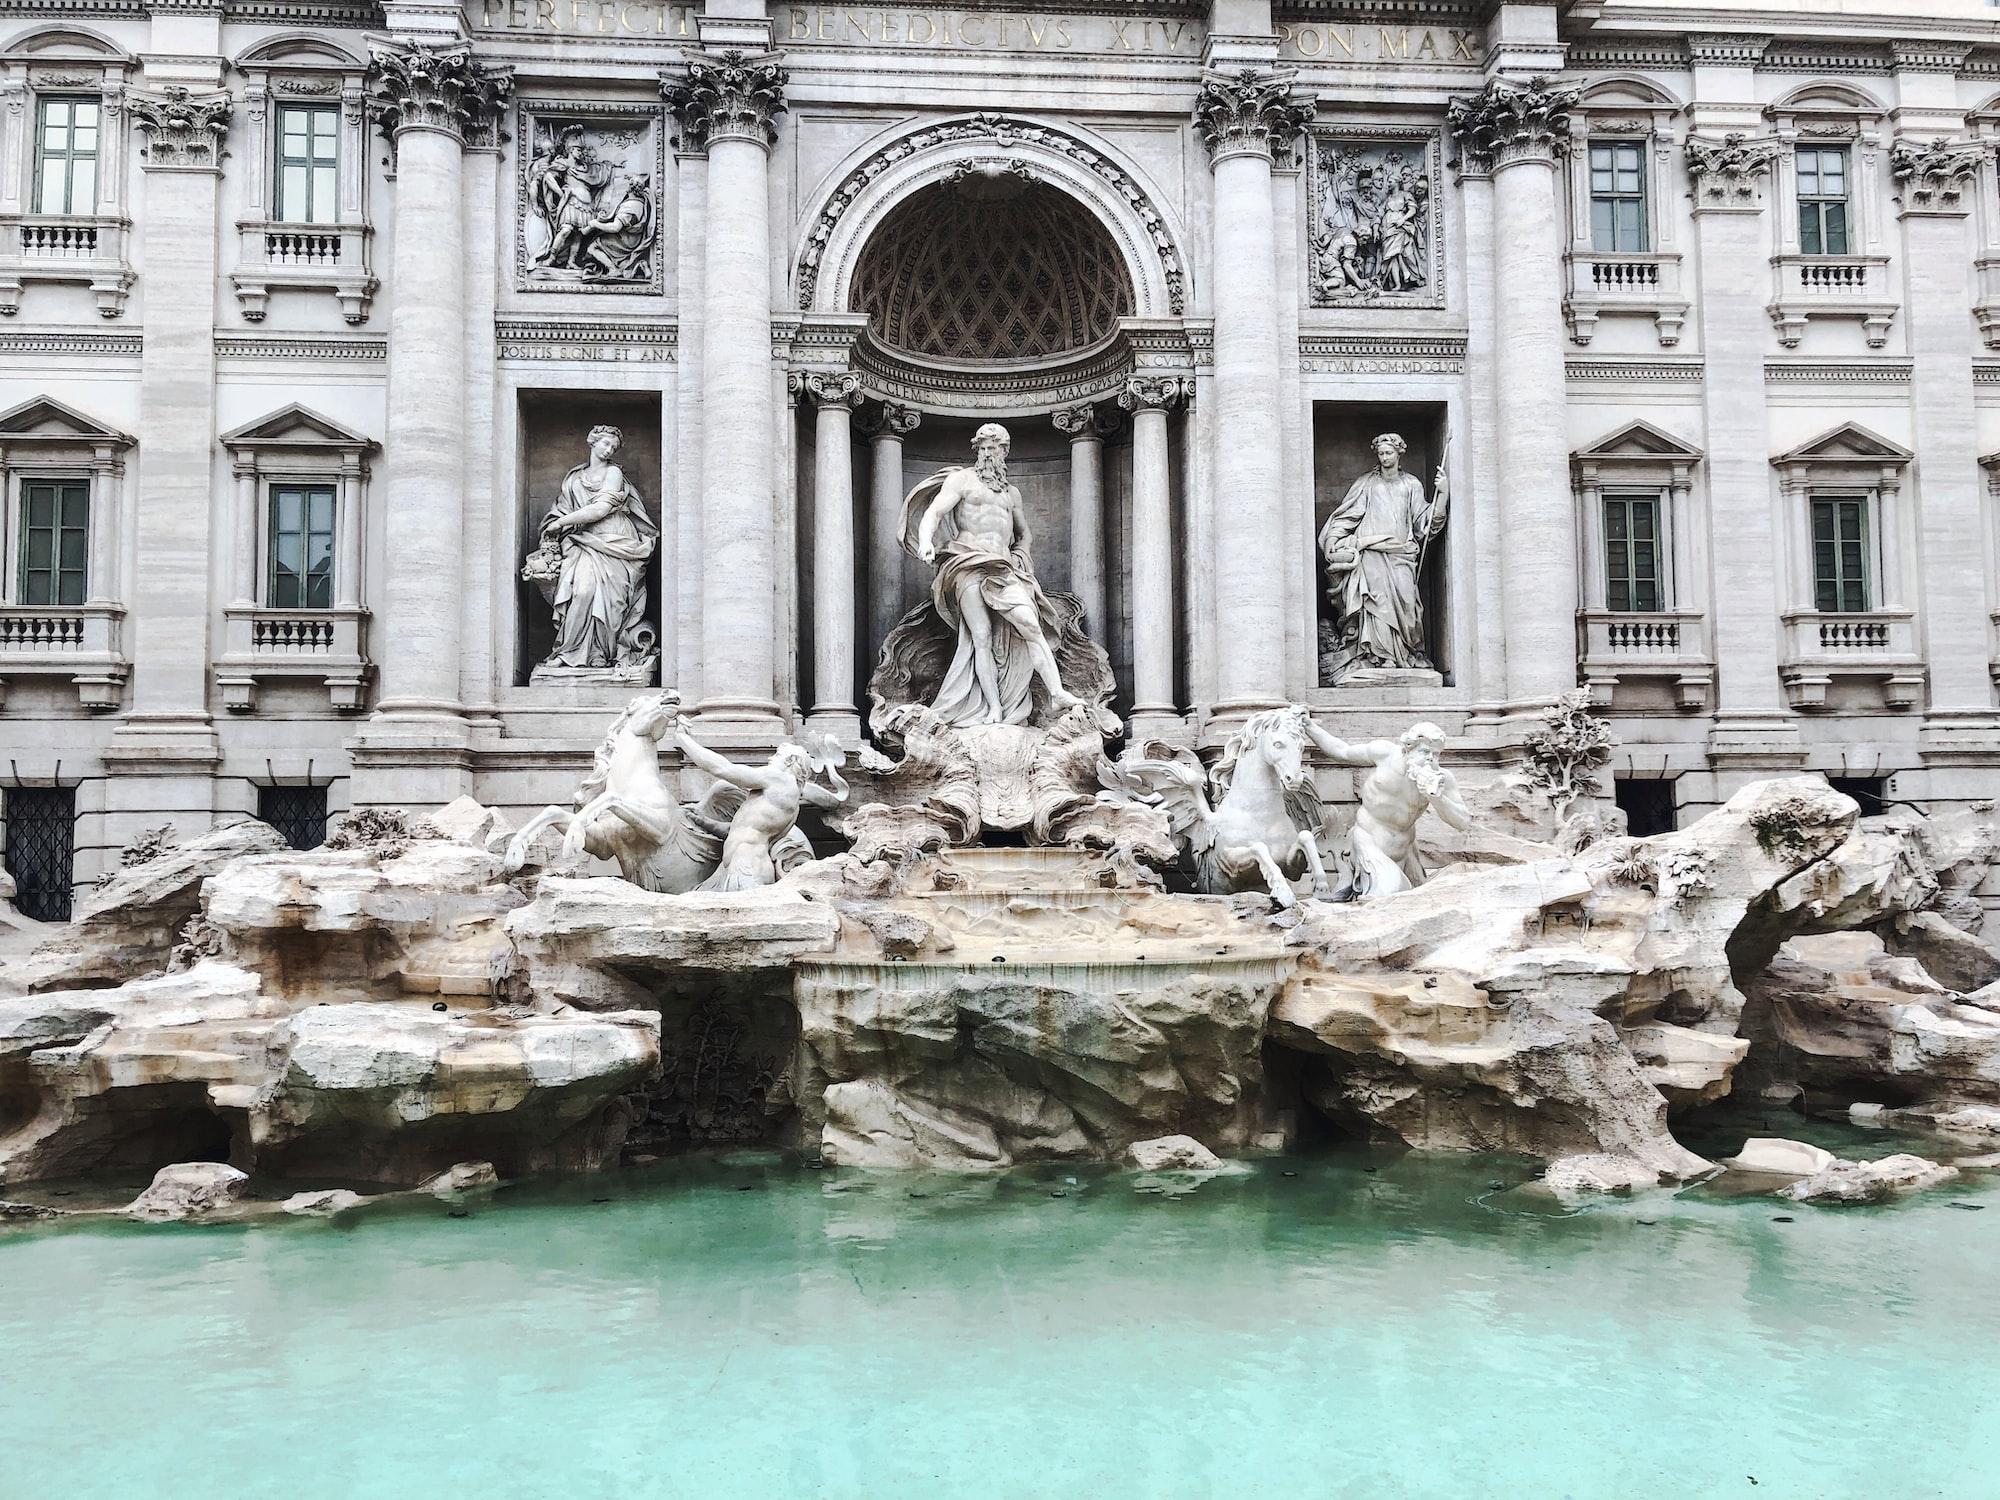 Vuelos baratos a Italia este verano